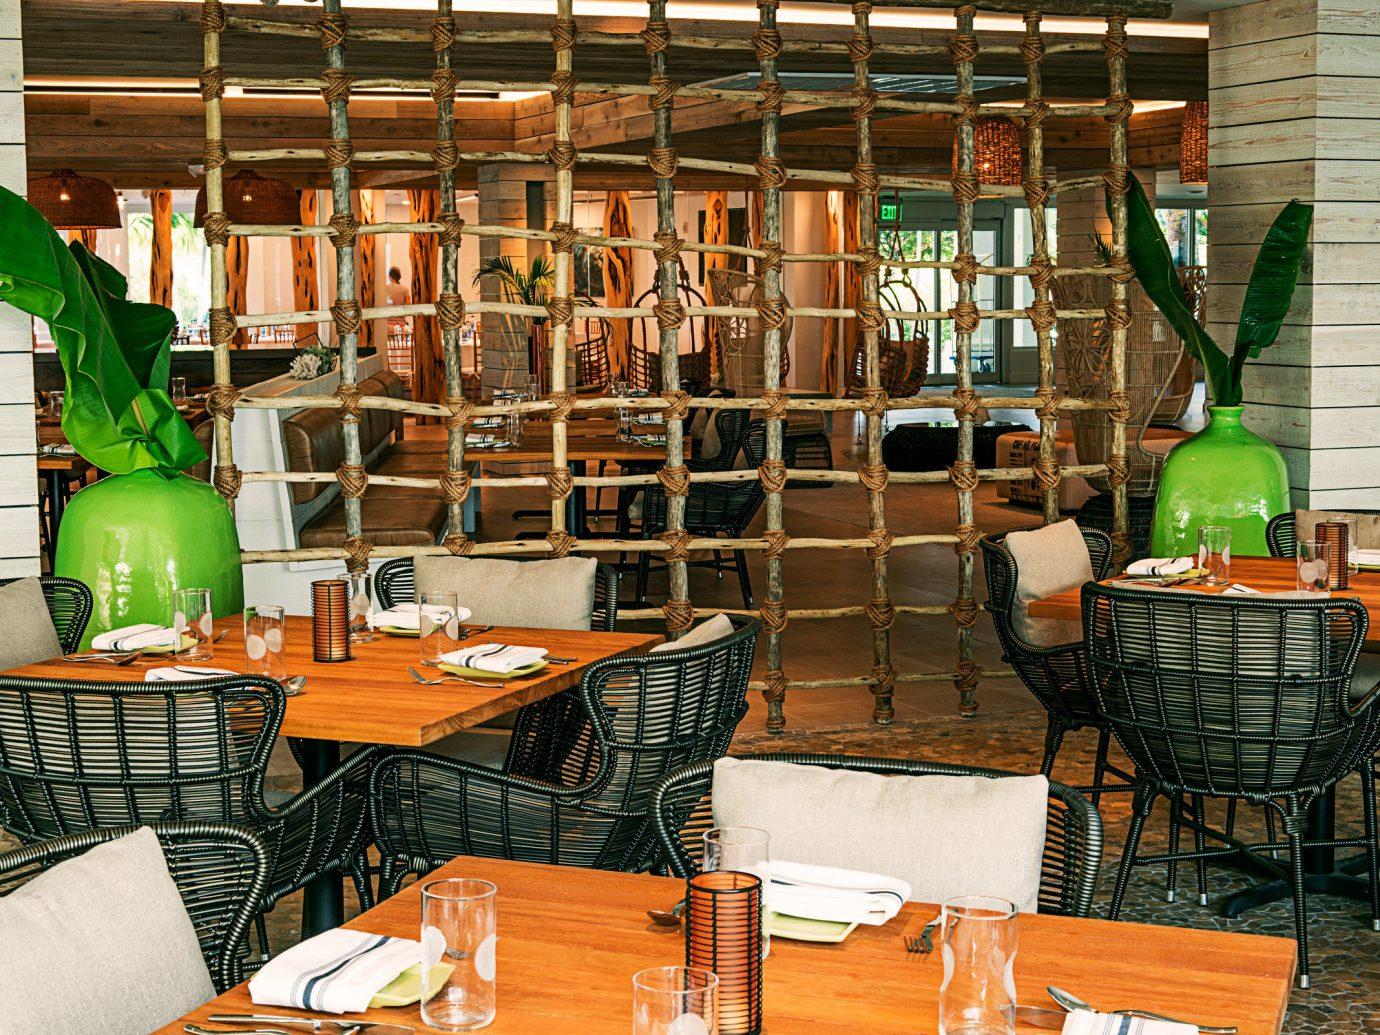 Beach Beachfront Dining Hotels Resort chair room building home restaurant interior design Design meal area furniture